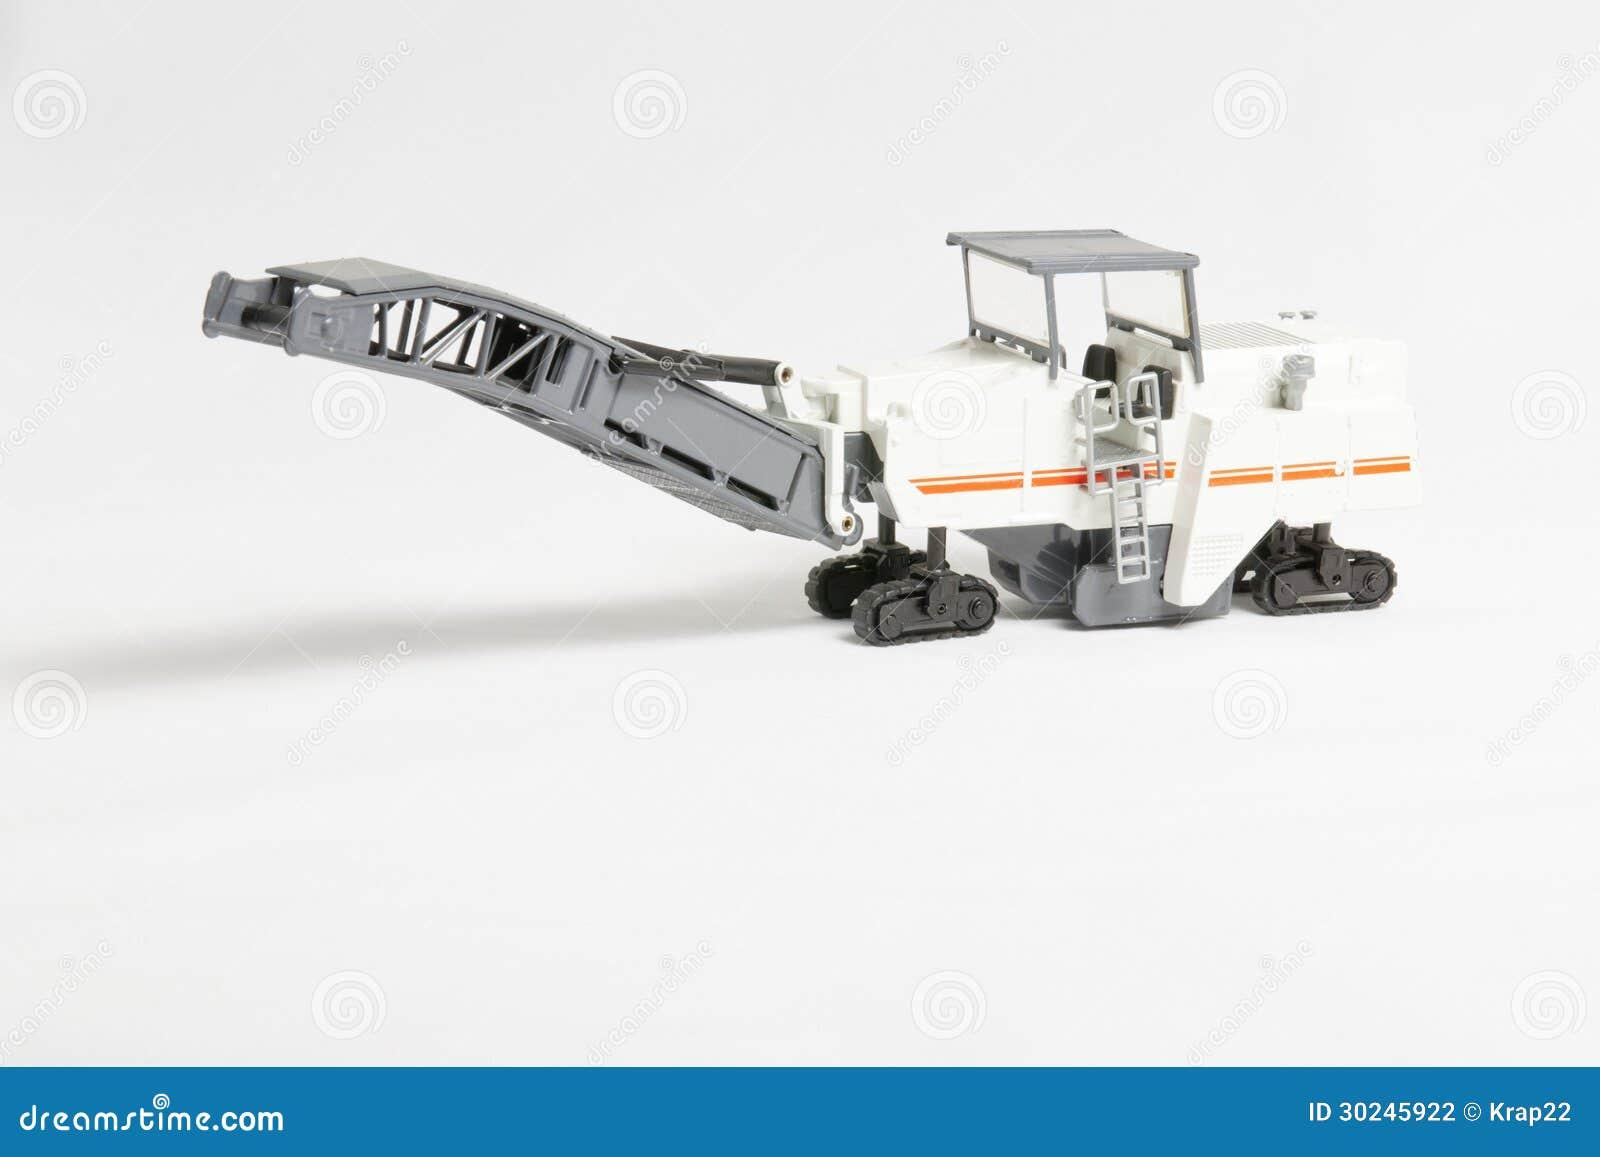 milling machine asphalt